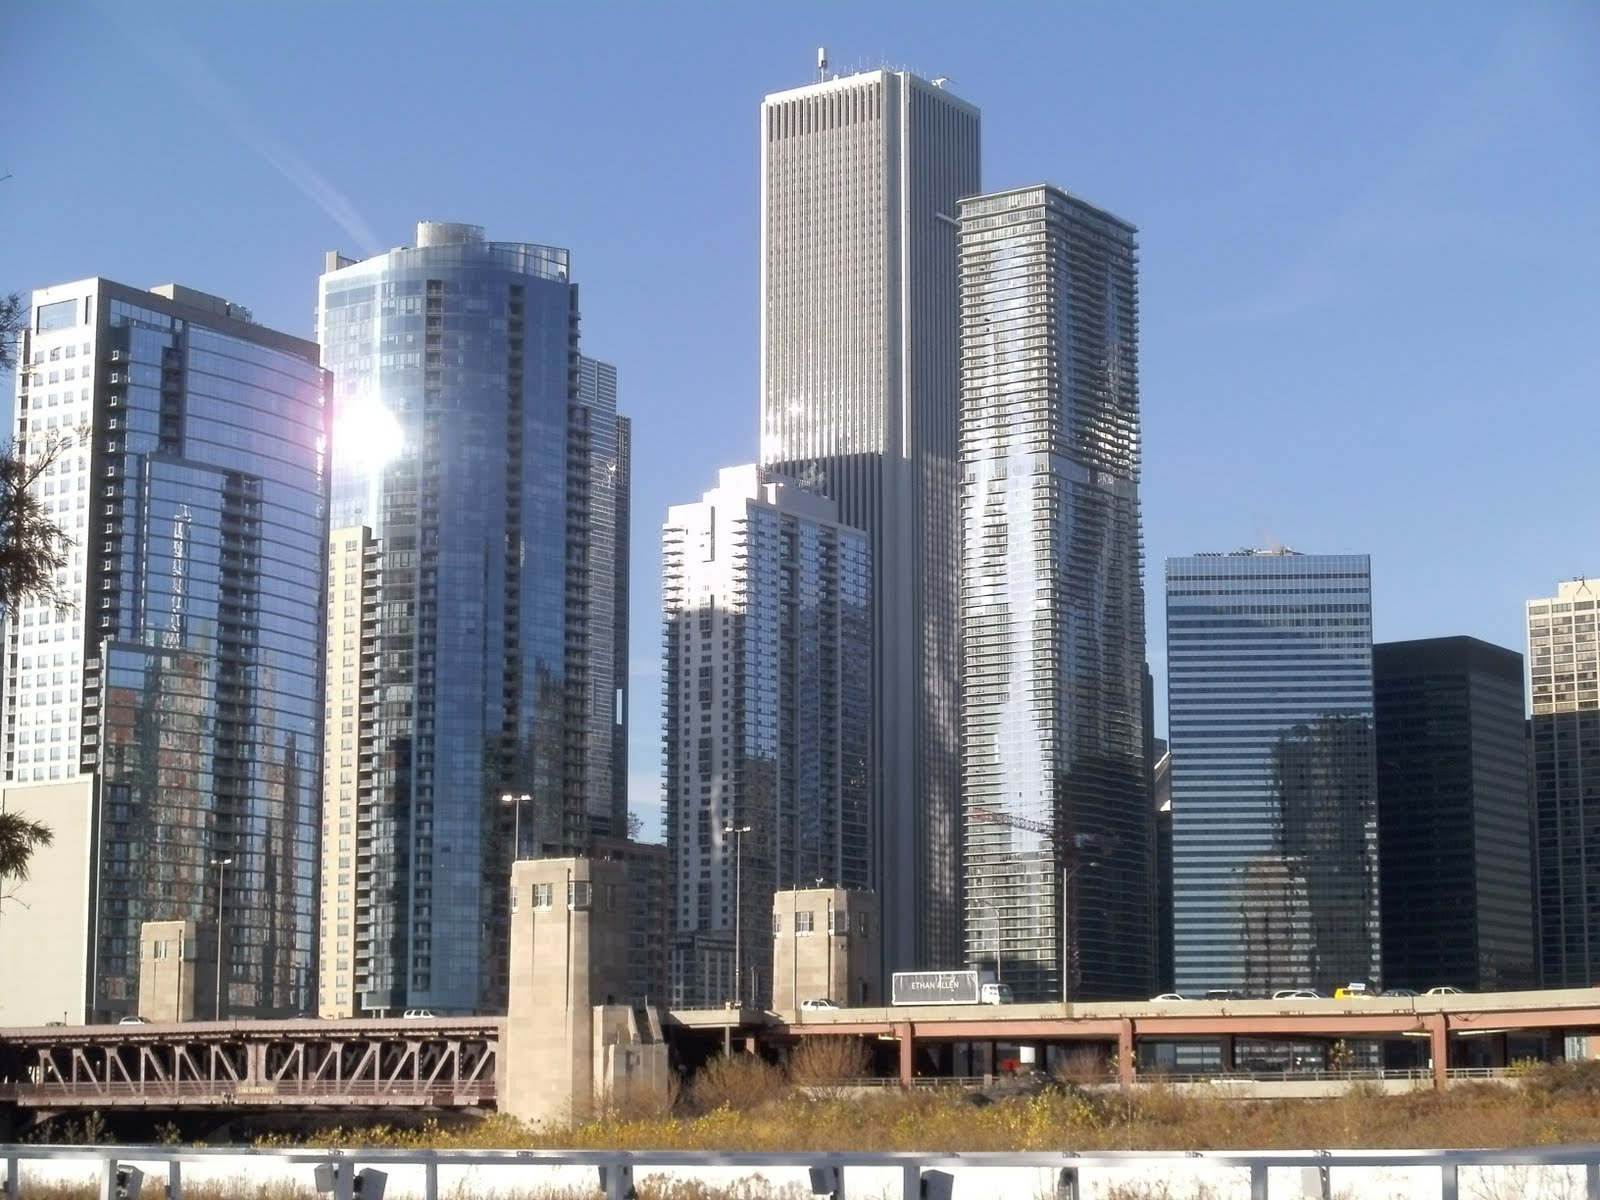 Rheumatologe Skyscrapers In North Korea And Chicago